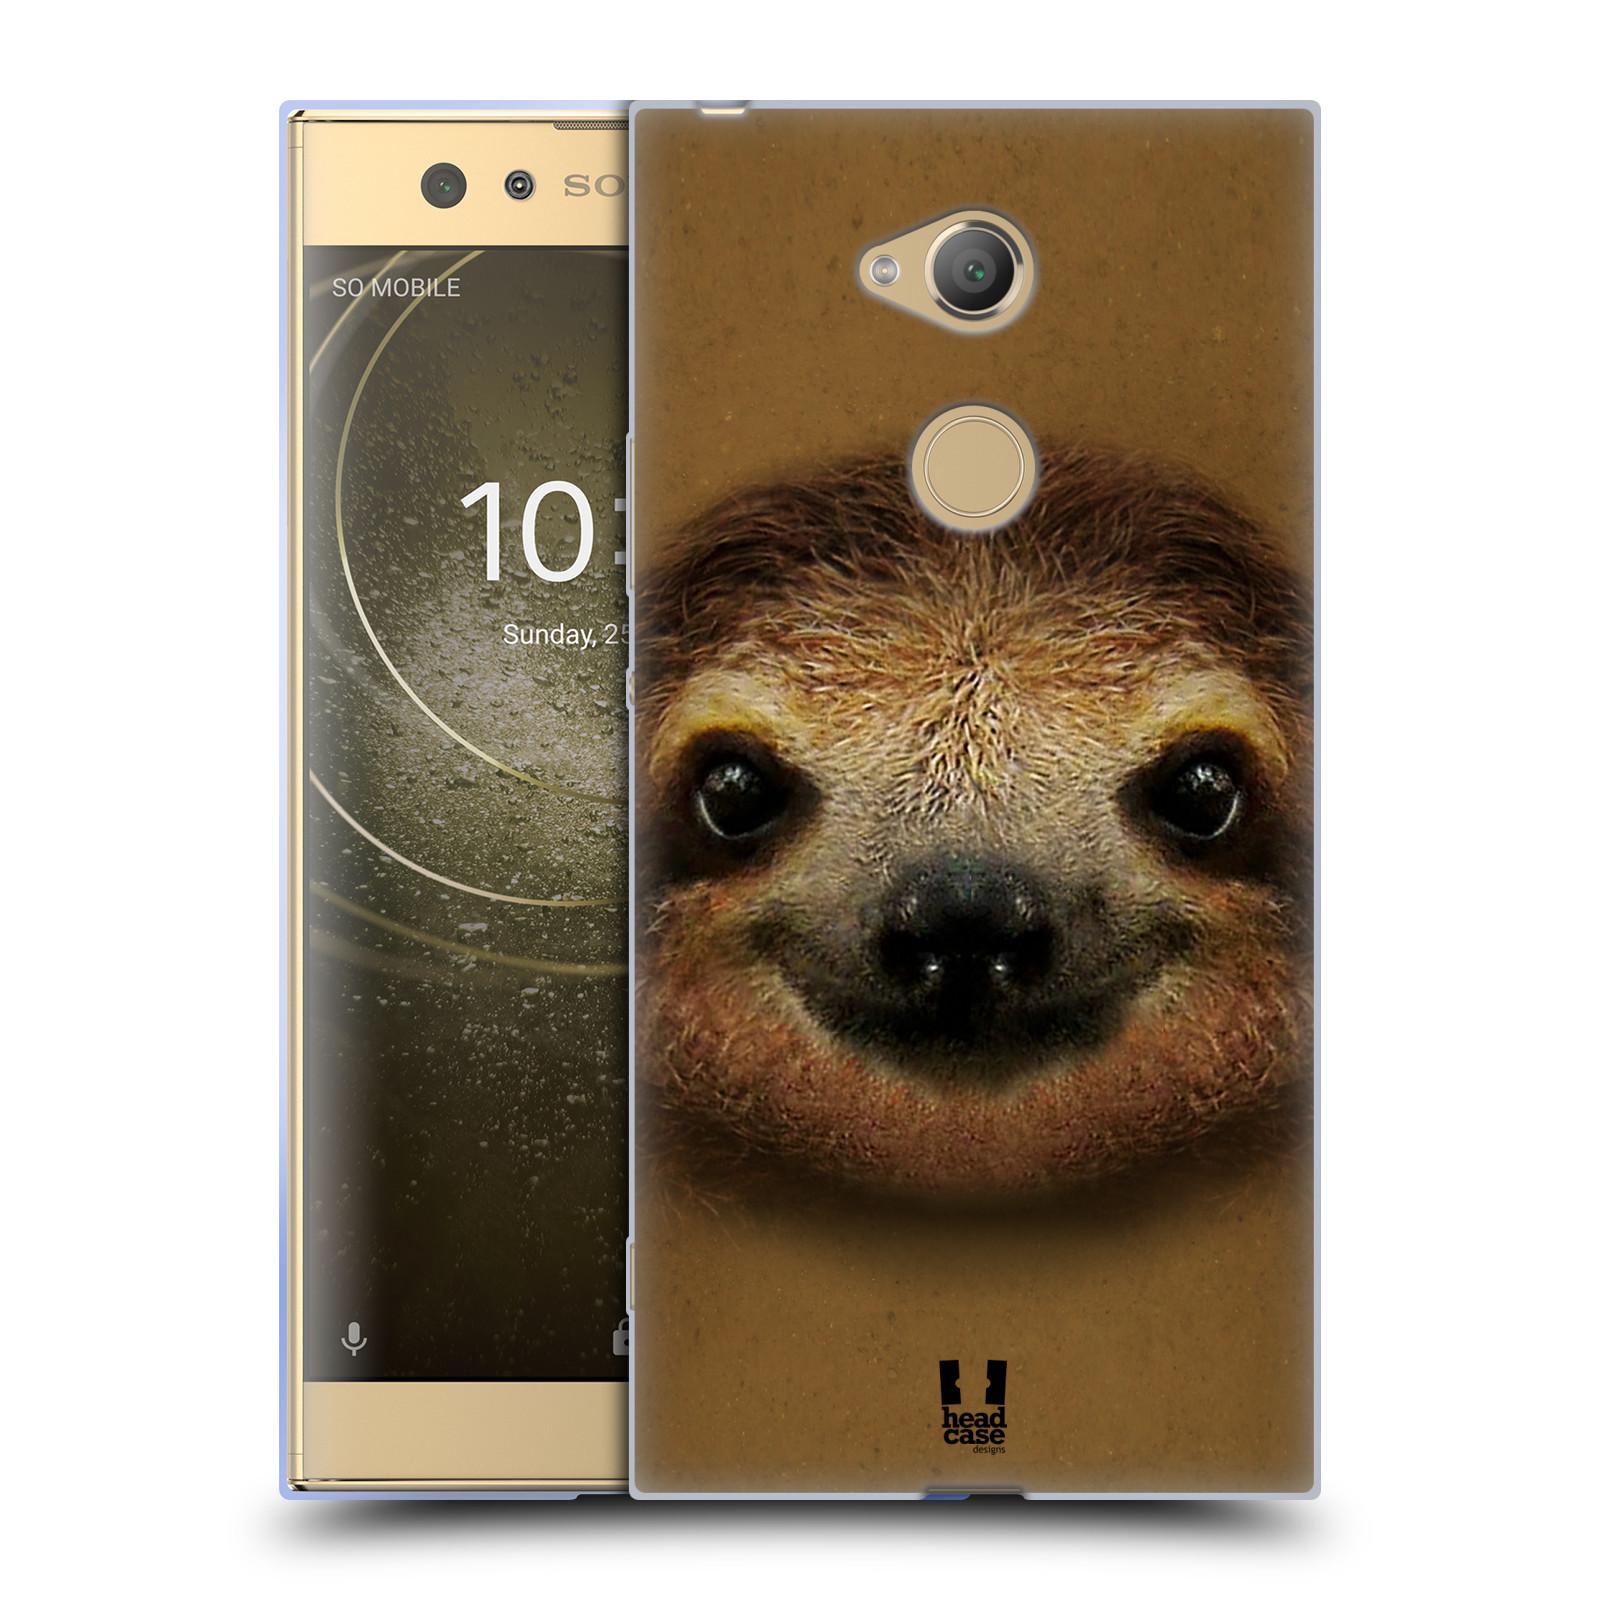 Pouzdro na mobil Sony Xperia XA2 Ultra vzor Zvířecí tváře 2 lenochod